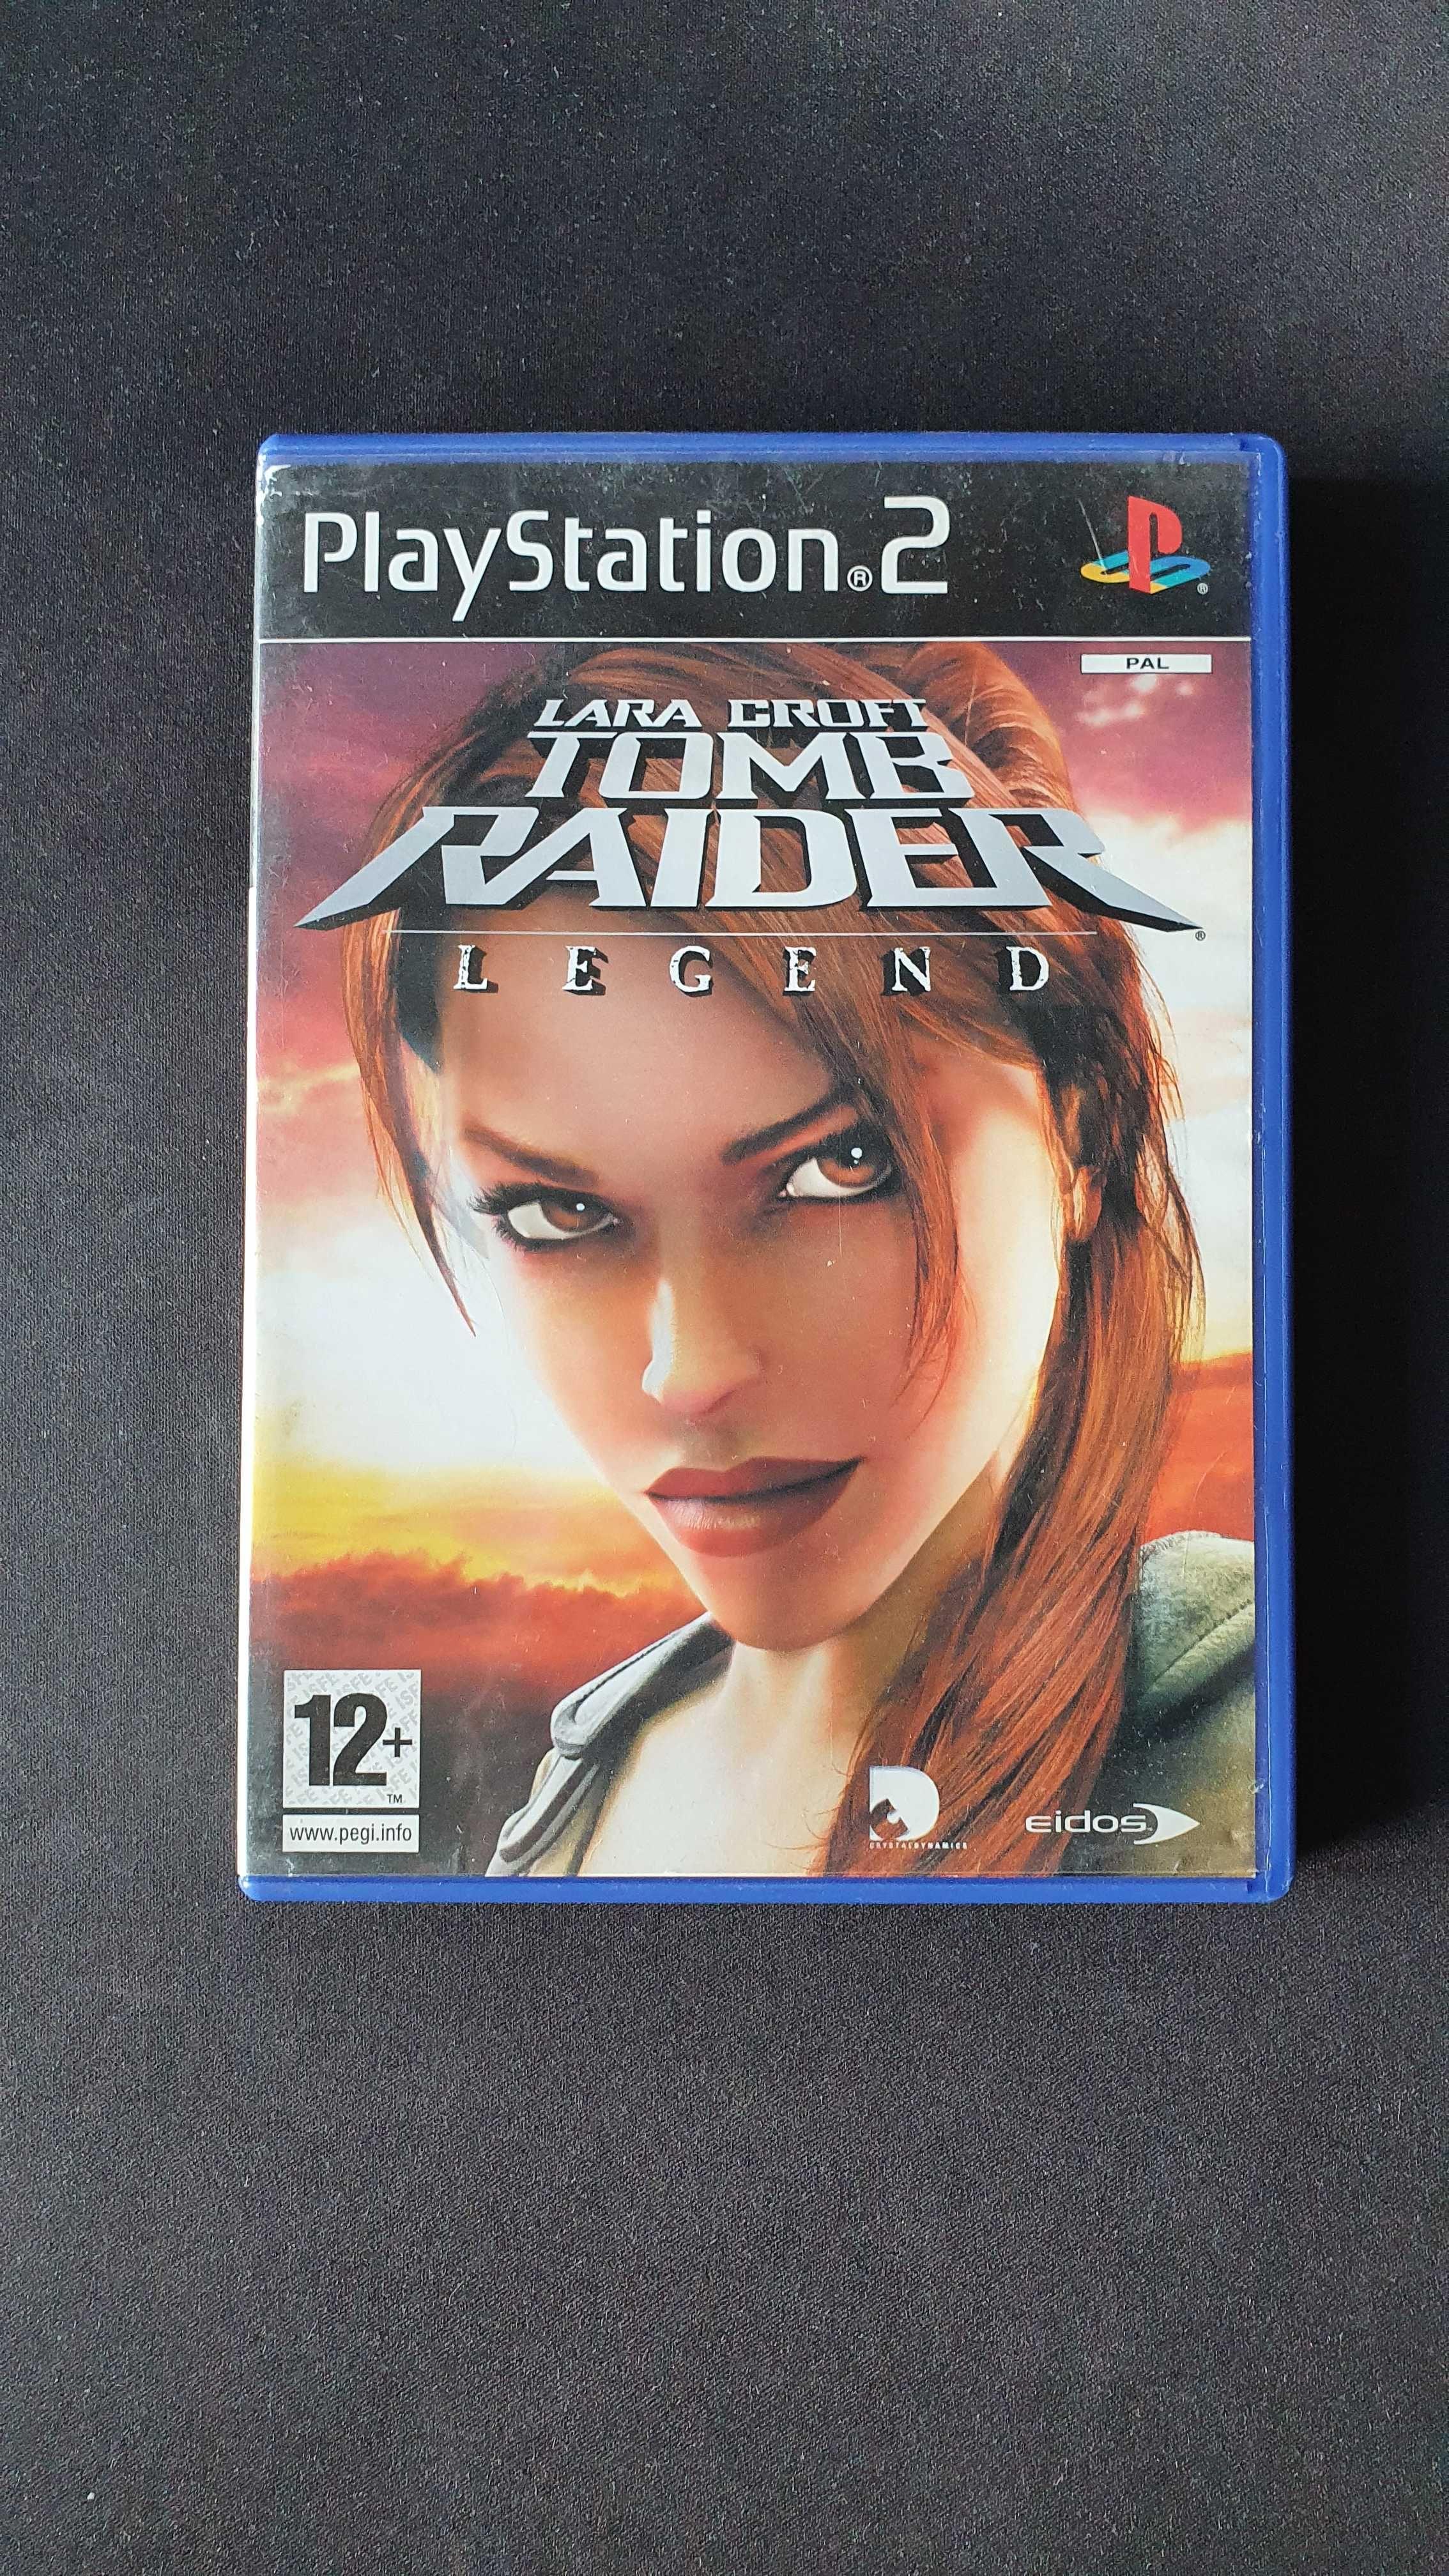 Tomb Raider: Legend - PS2